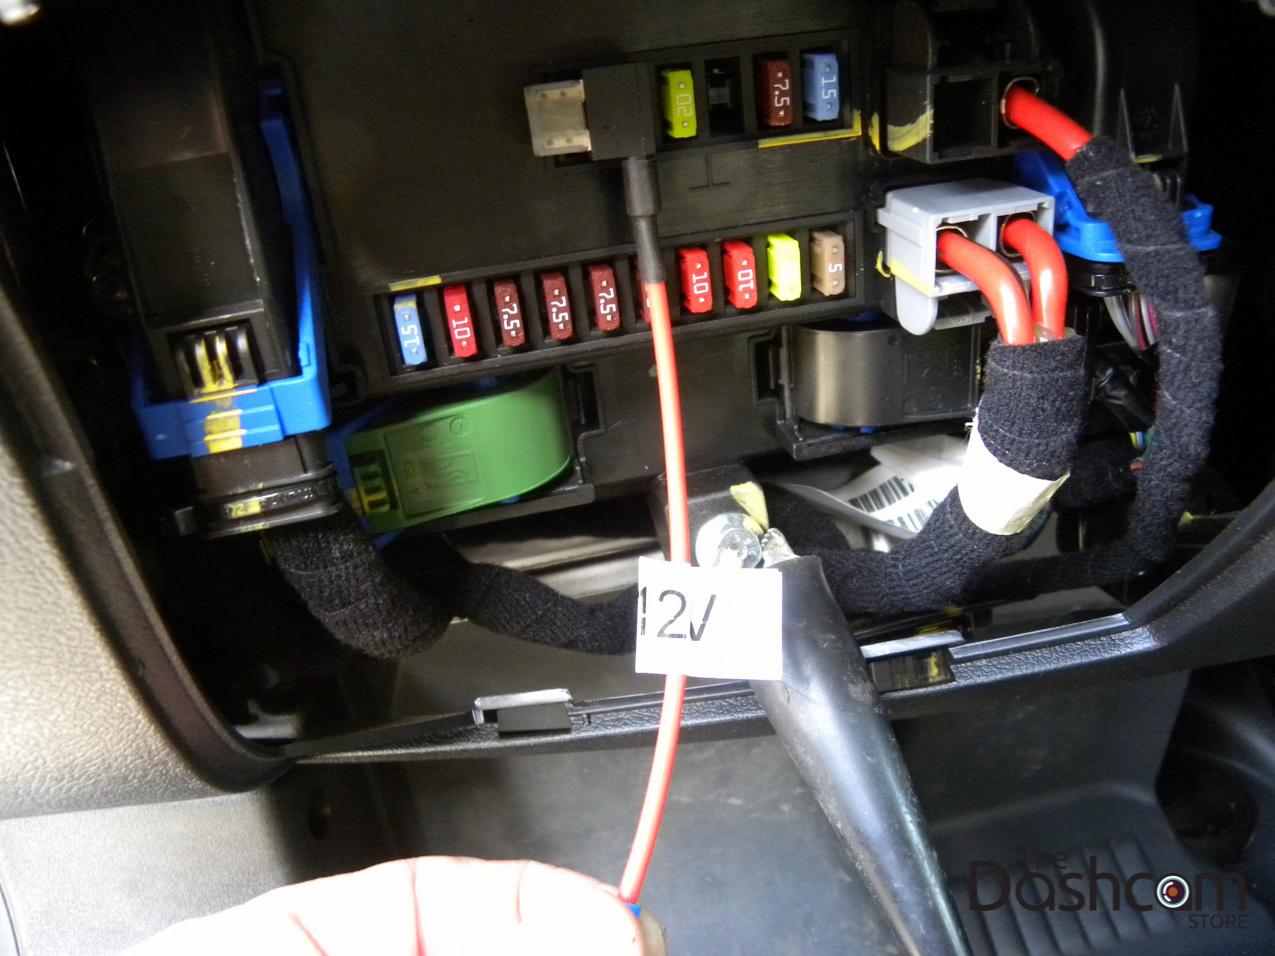 Fuse Box Diagram 2015 Dodge Ram Promaster Blackvue Dr650gw 2ch Dashcam